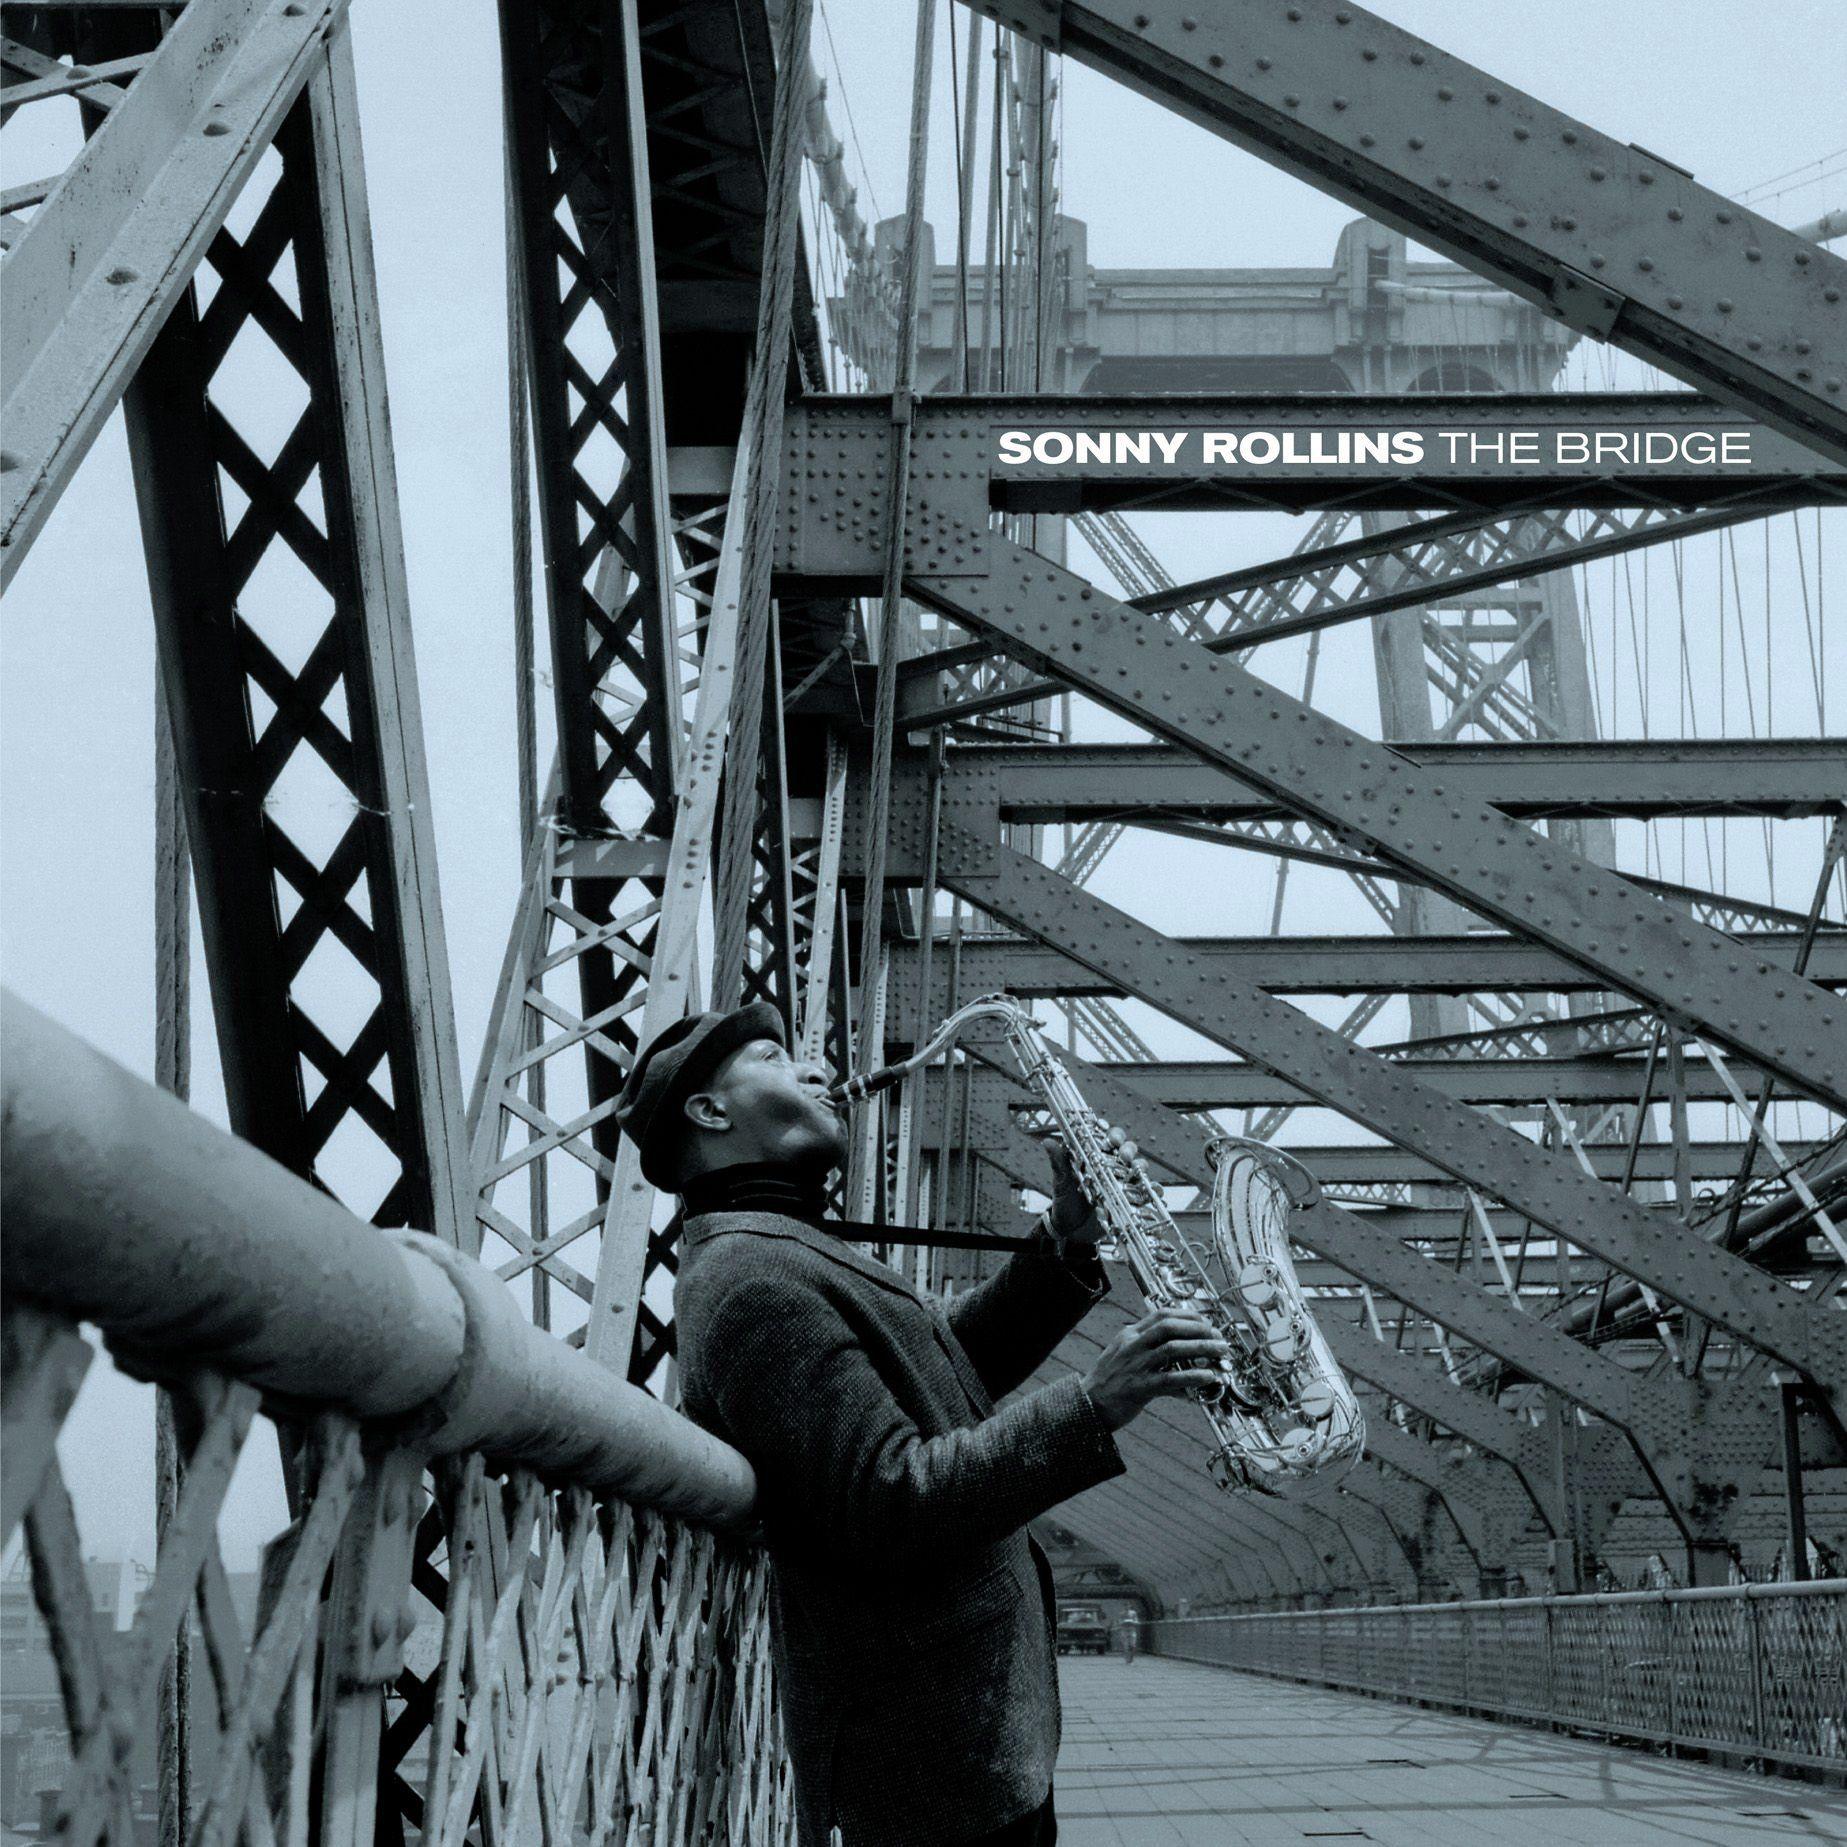 Bridge by Sonny Rollins